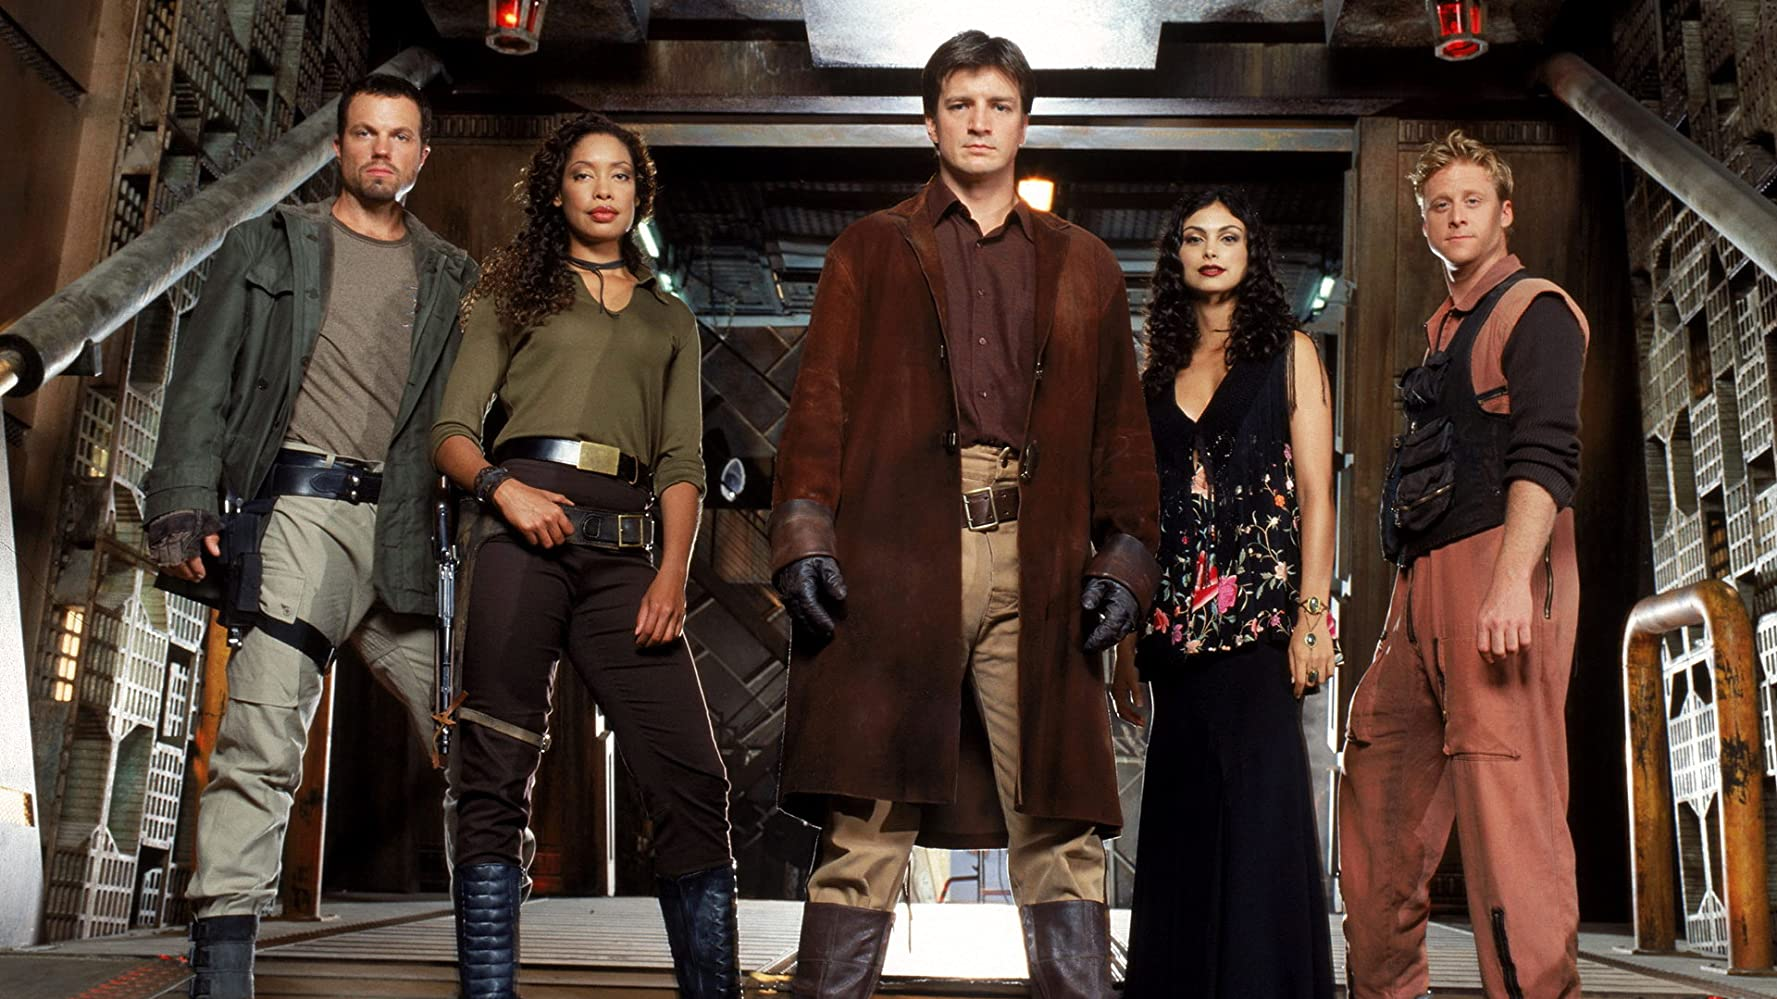 Jayne Cobb (Adam Baldwin), Zoe (Gina Torres), Captain Malcolm Reynolds (Nathan Fillion), Inara Serra (Morena Baccarin) and Wash Washburne (Alan Tudyk) in Serenity (2005)